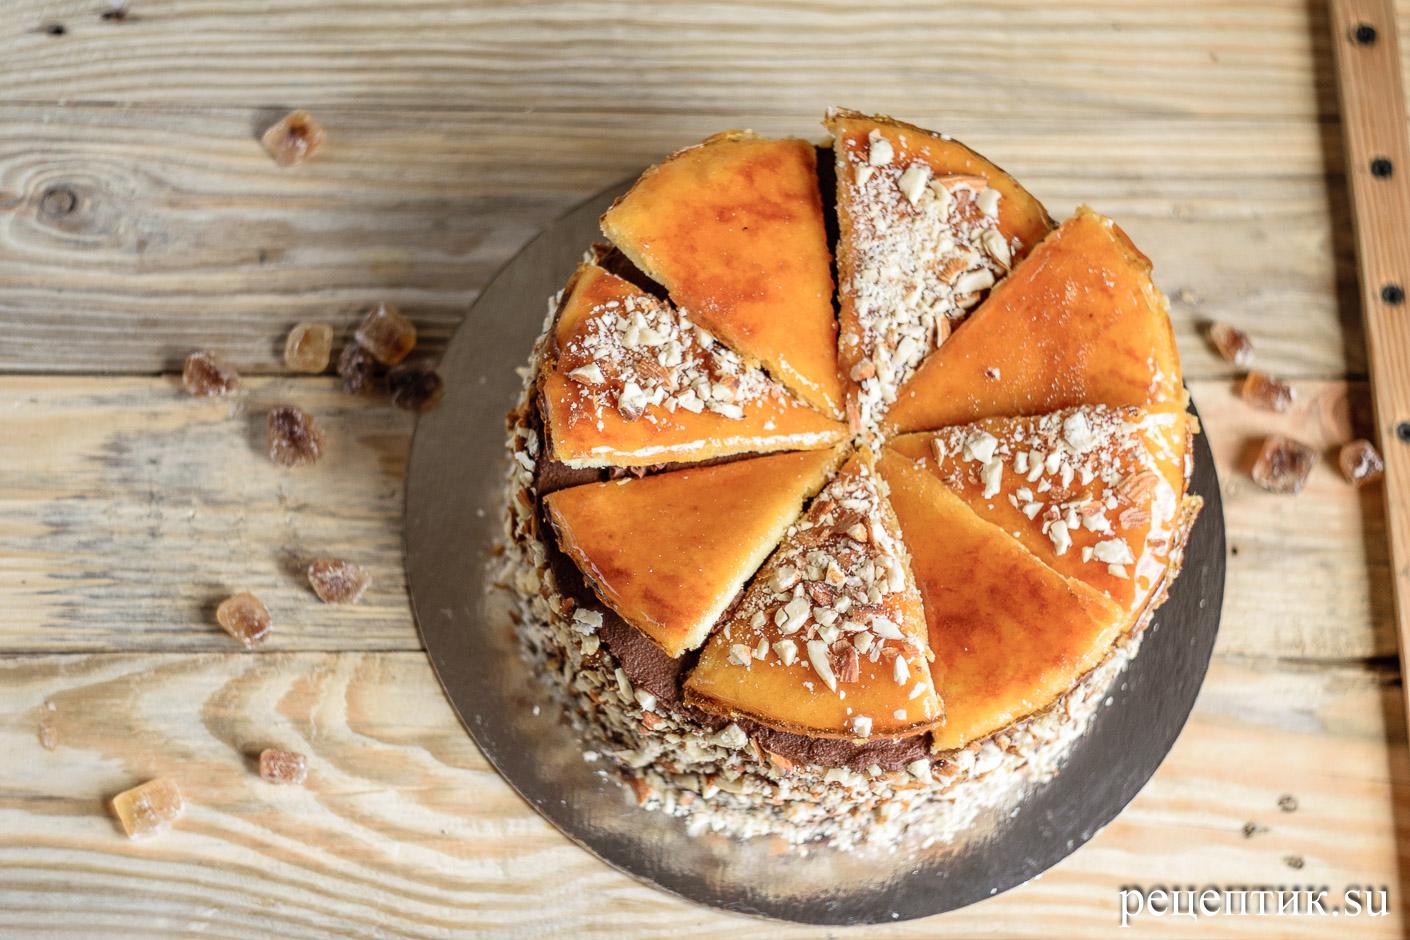 Торт «Добош» - рецепт с фото, шаг 28